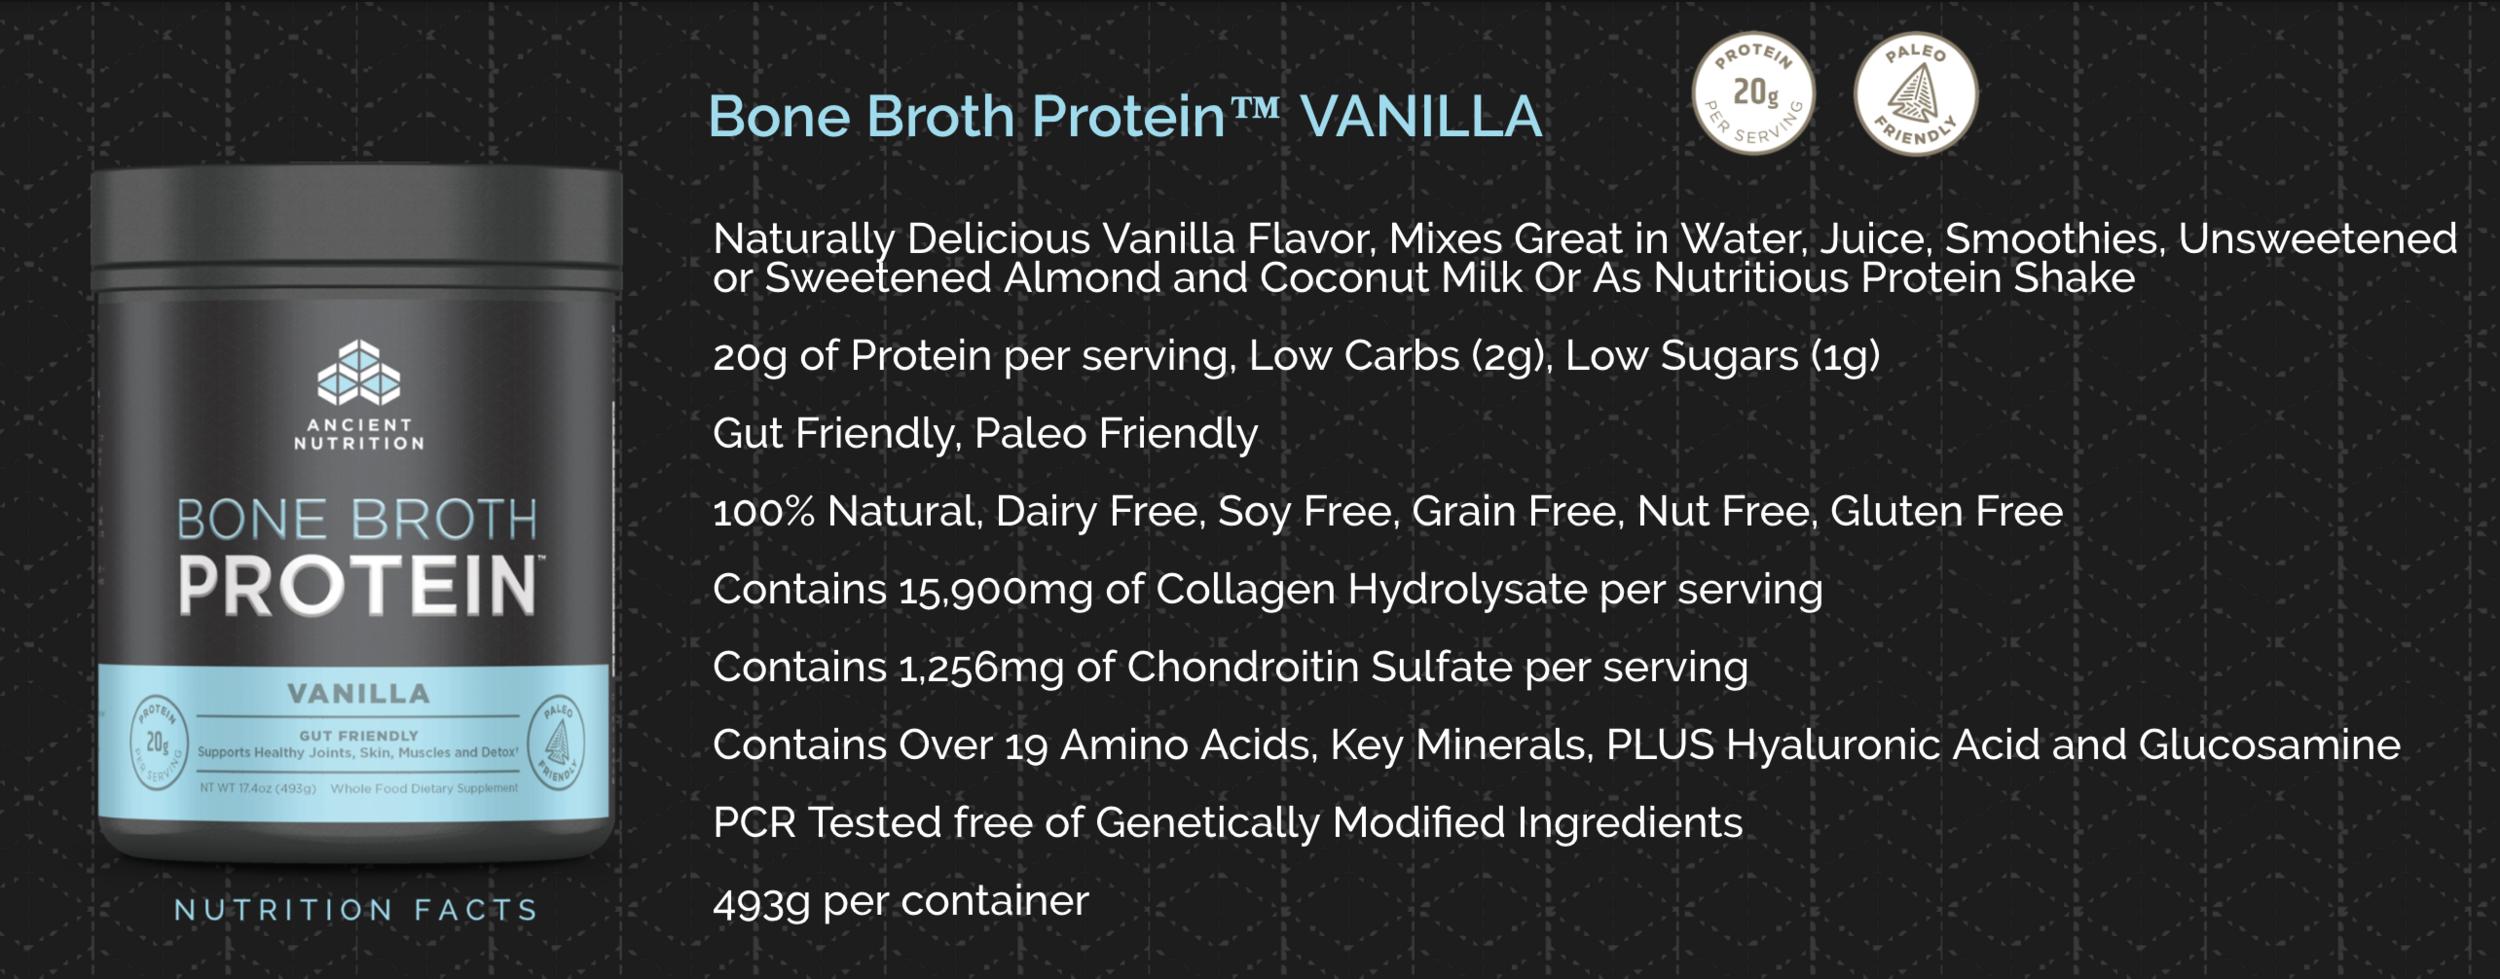 vanilla-bone-broth-protein-nutritional-facts